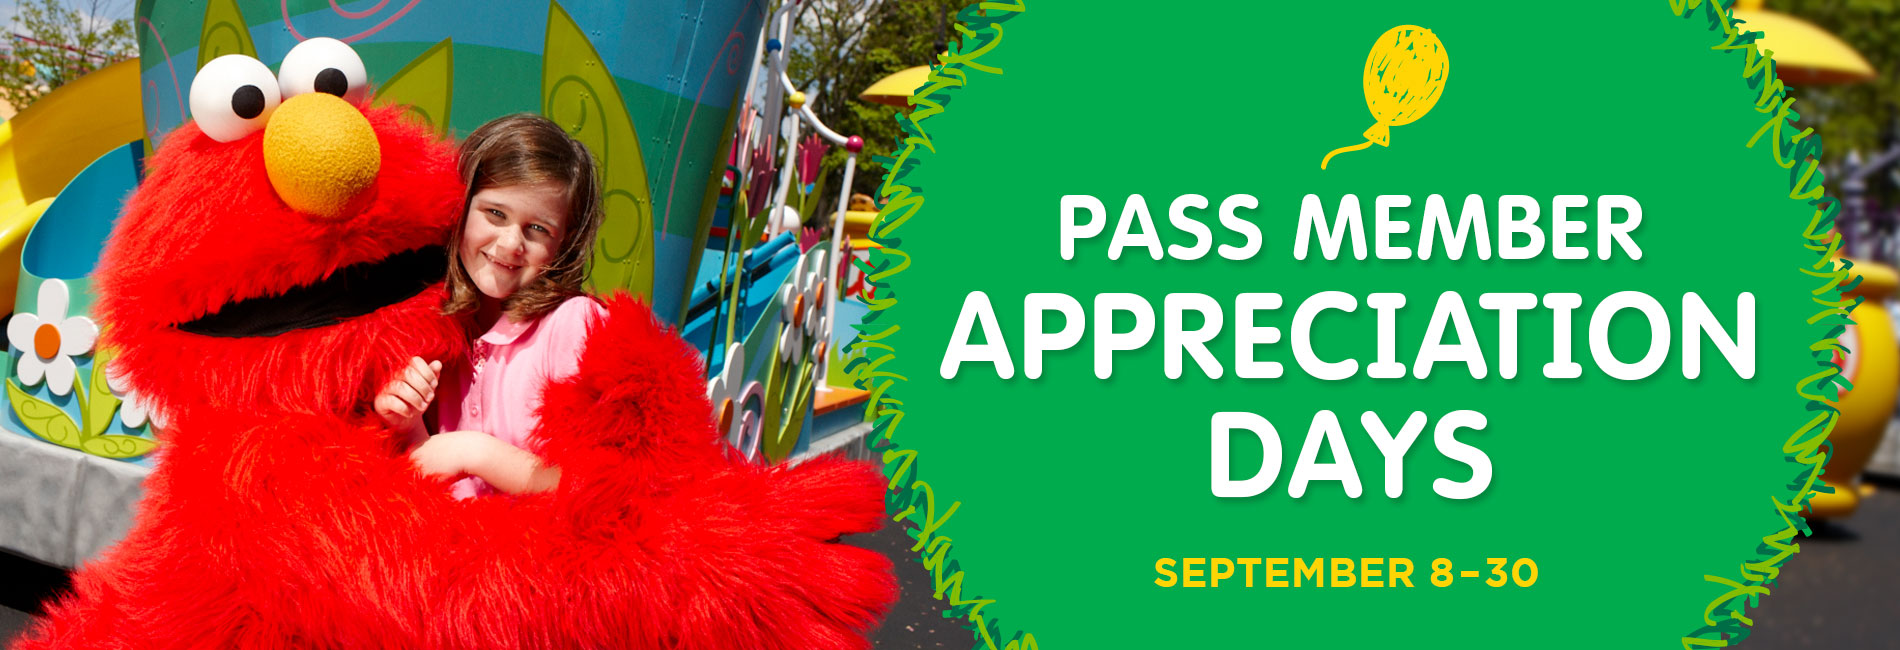 Pass Member Appreciation Days